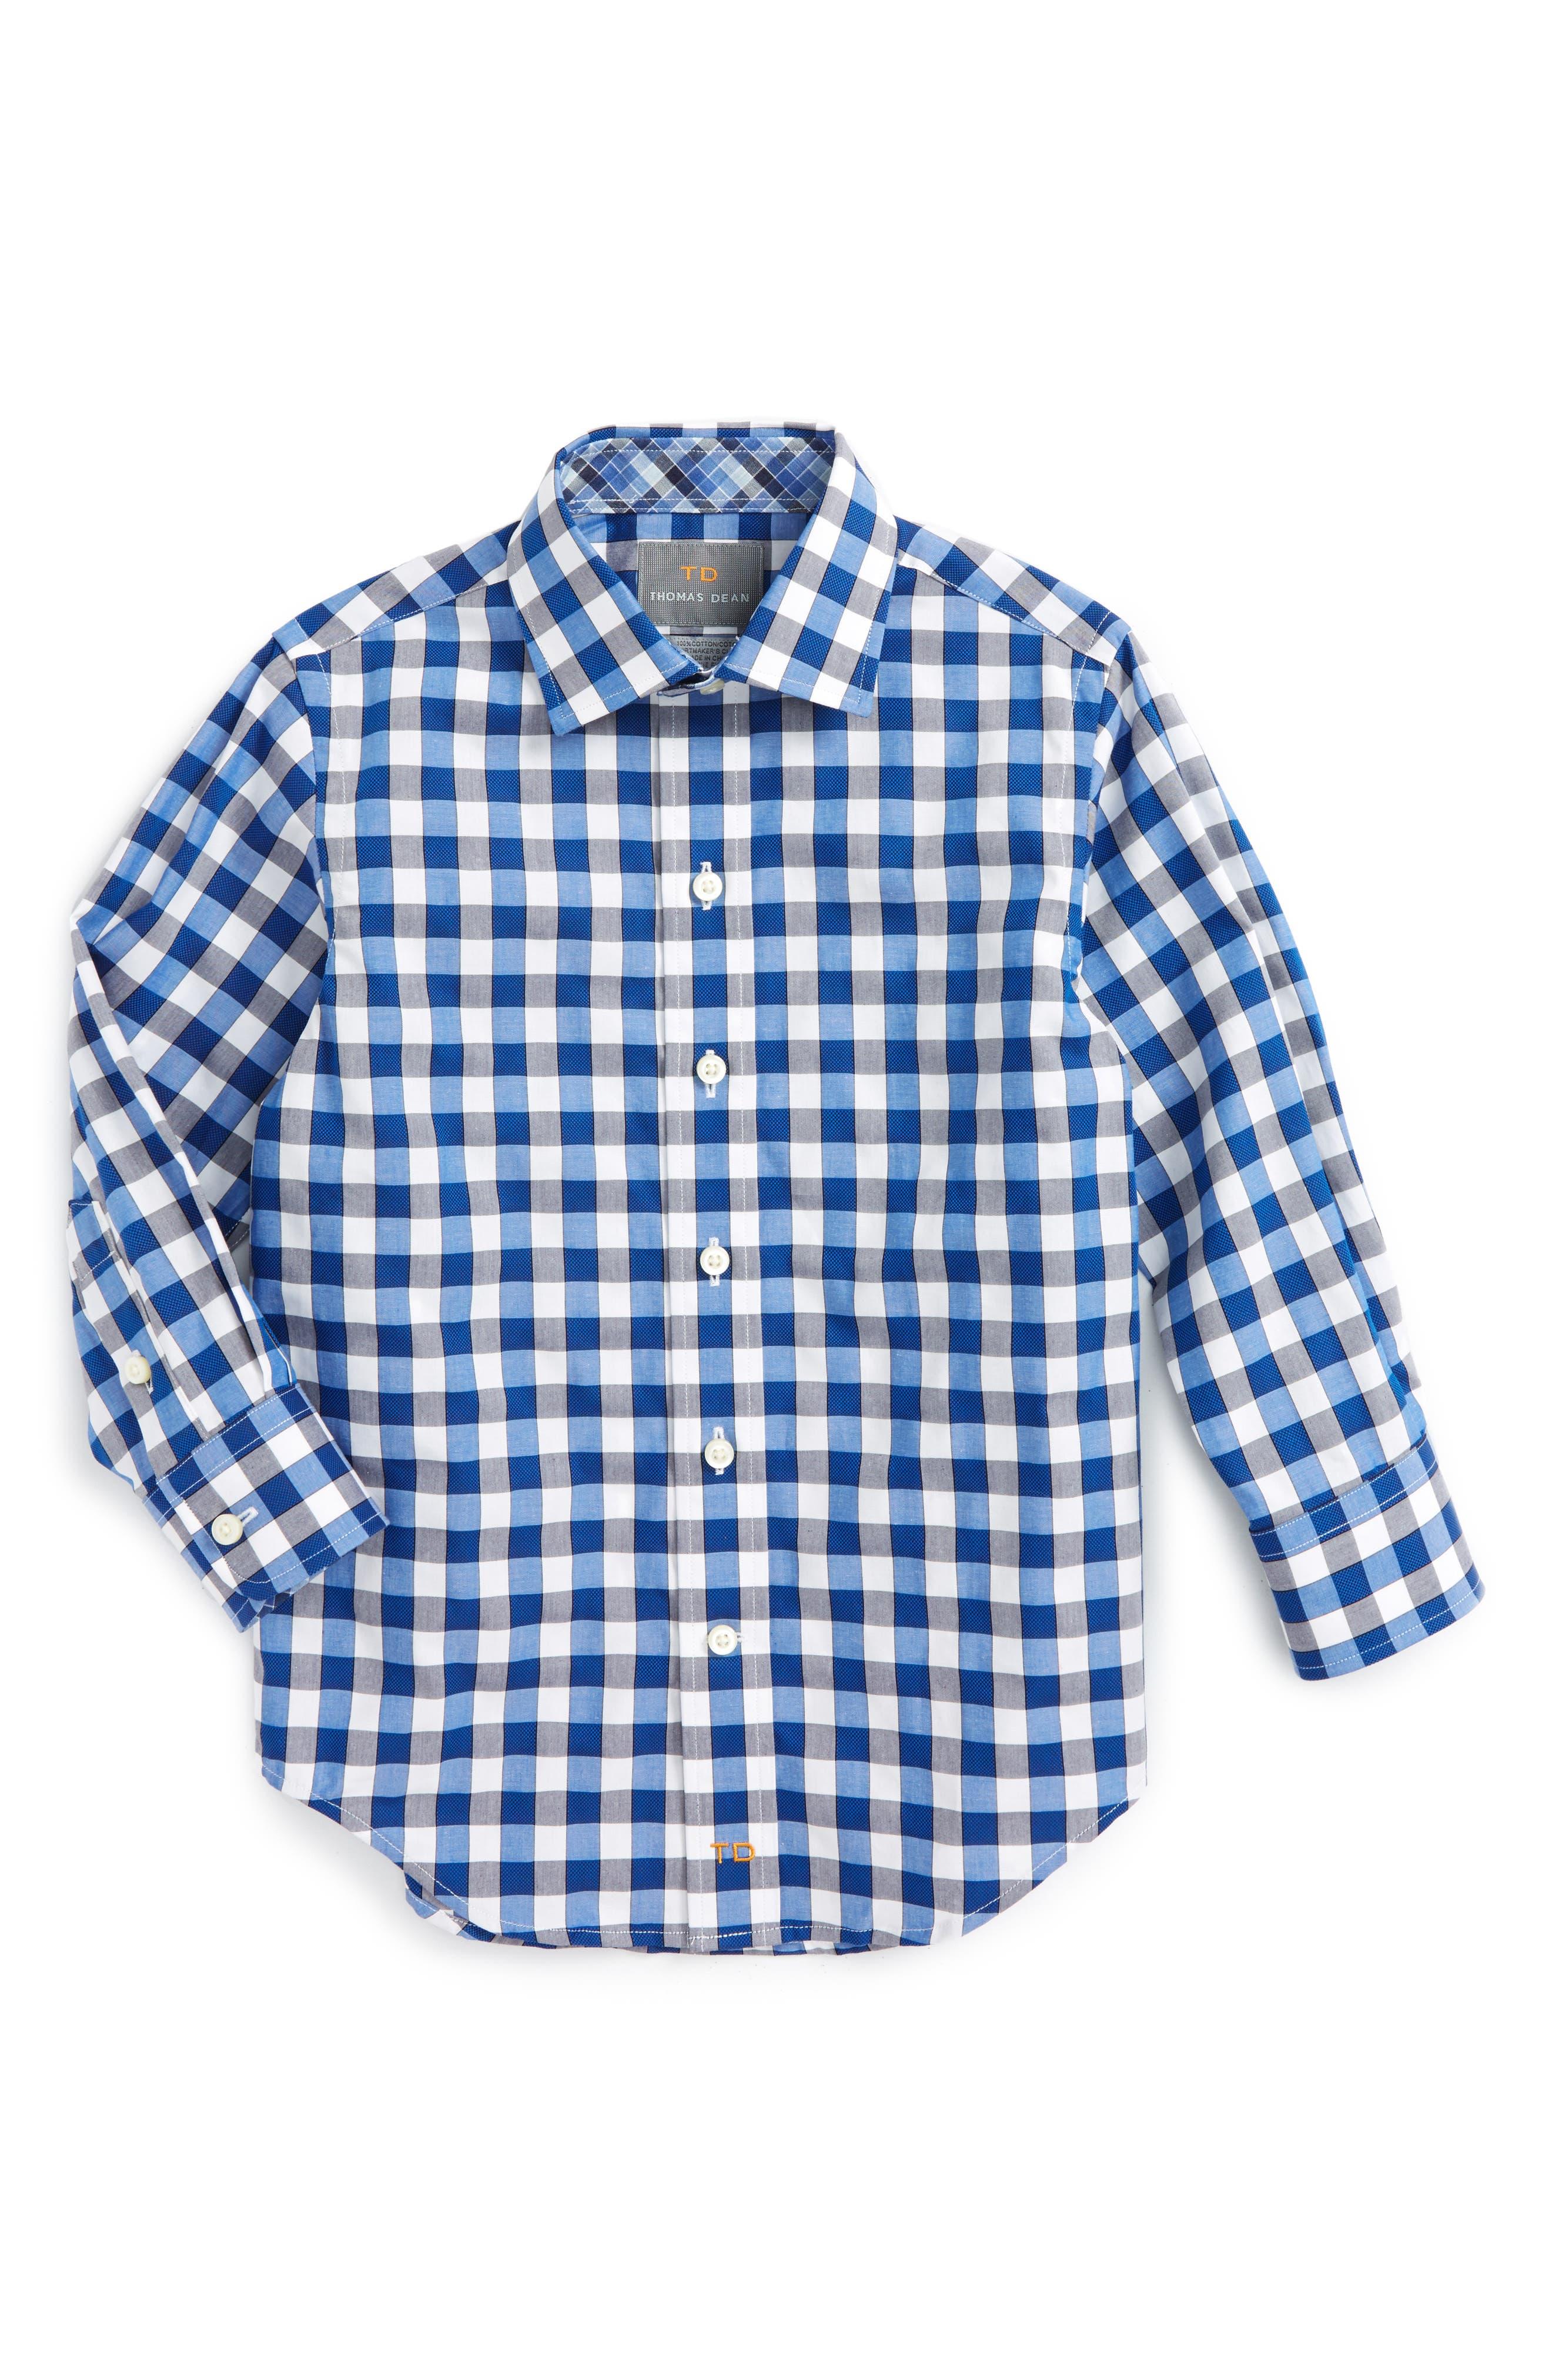 THOMAS DEAN Gingham Dress Shirt